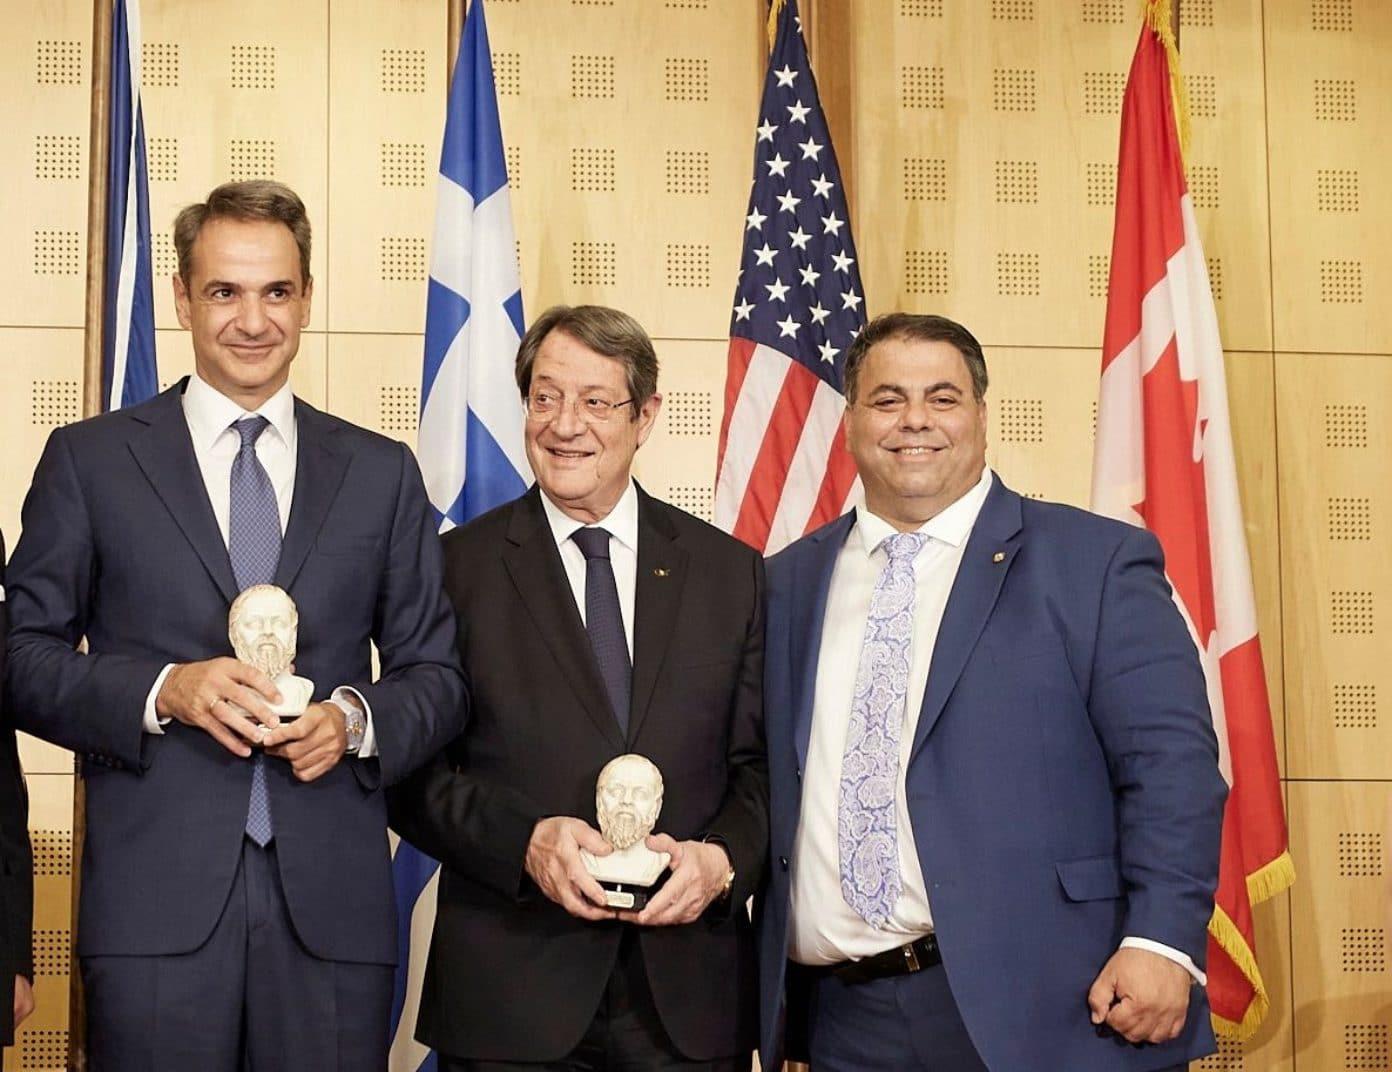 AHEPA award Mitsotakis Anastasiades